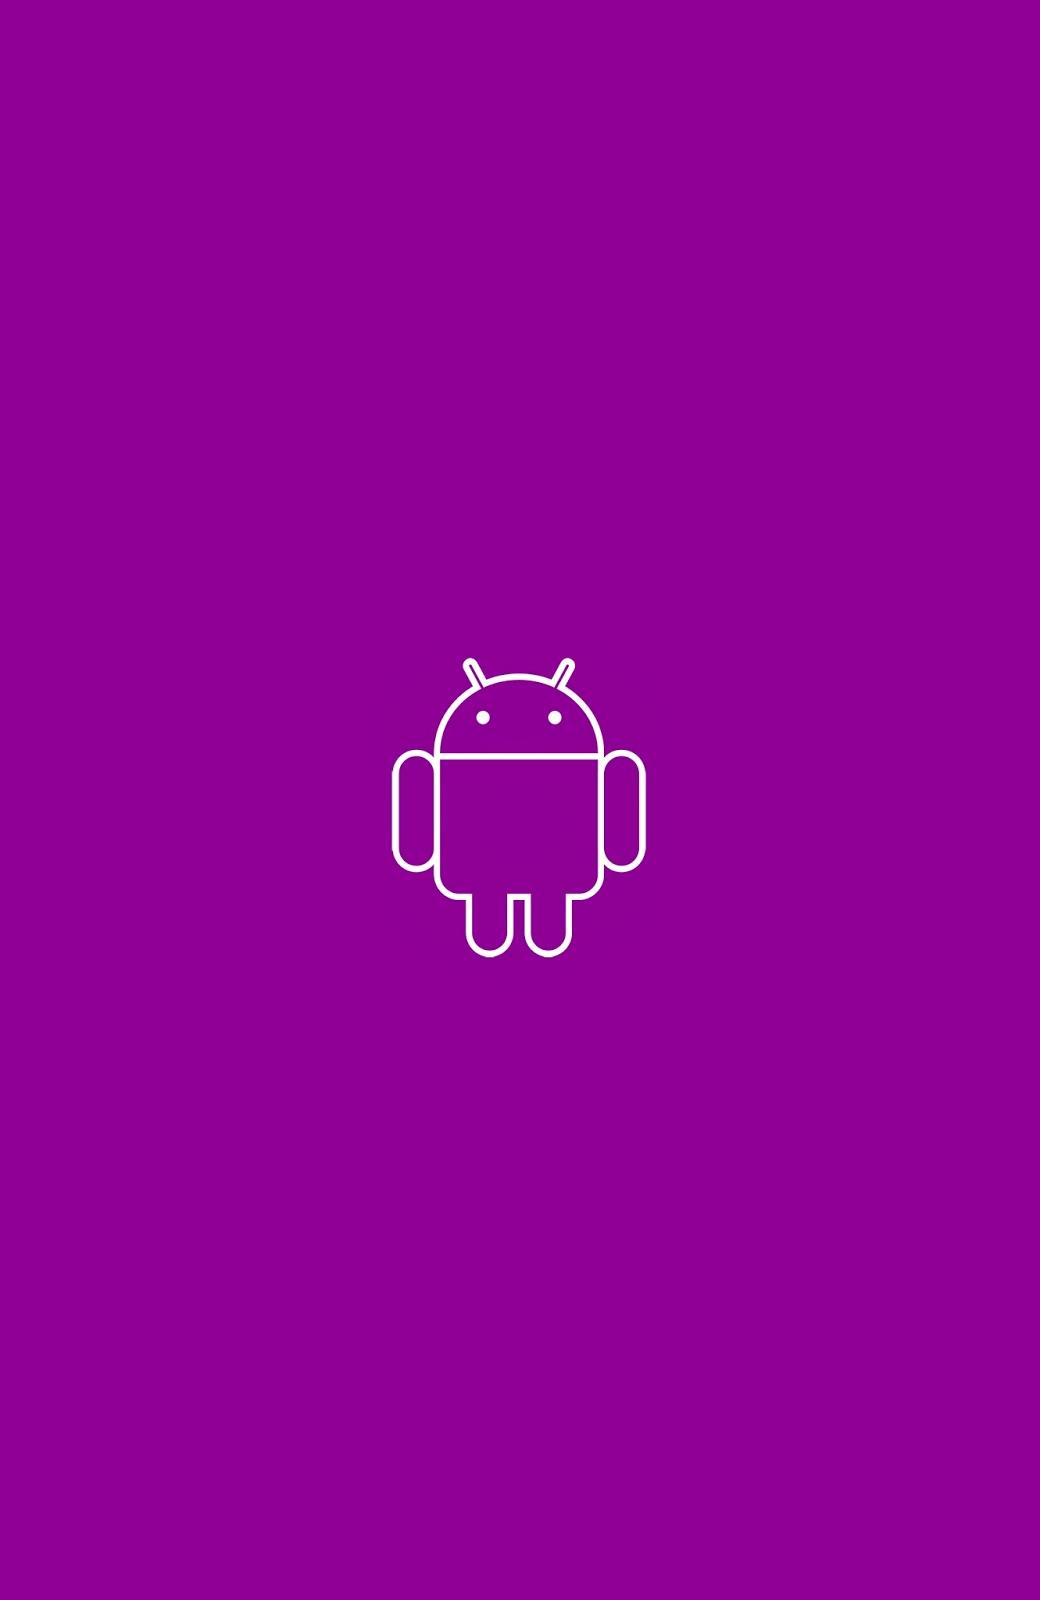 November 20, 2018 - Samsung Firmware Daily Updates